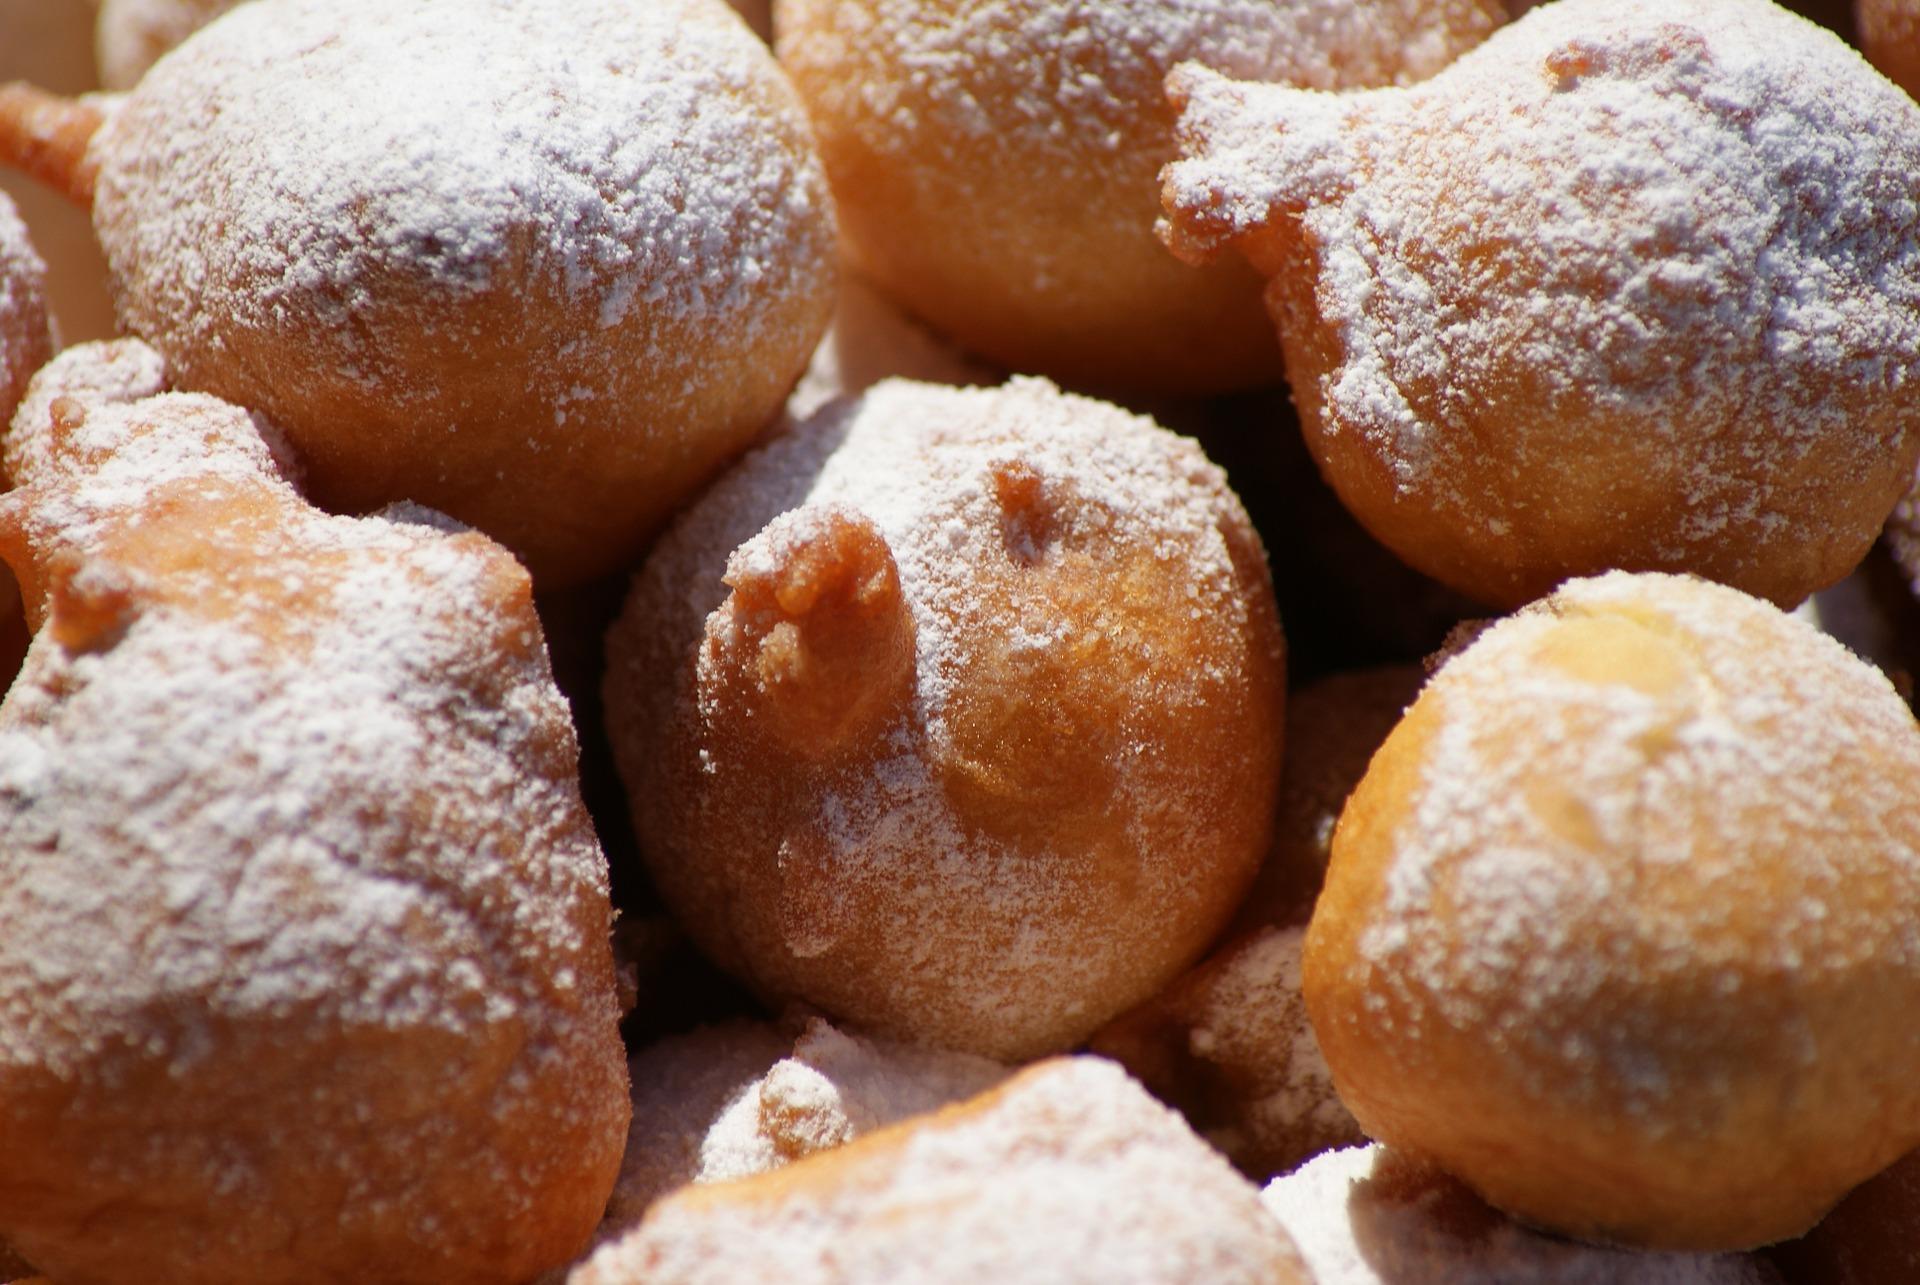 Gogosi pufoase si delicioase - sfatulparintilor.ro - pixabay_com - a-delicacy-322722_1920